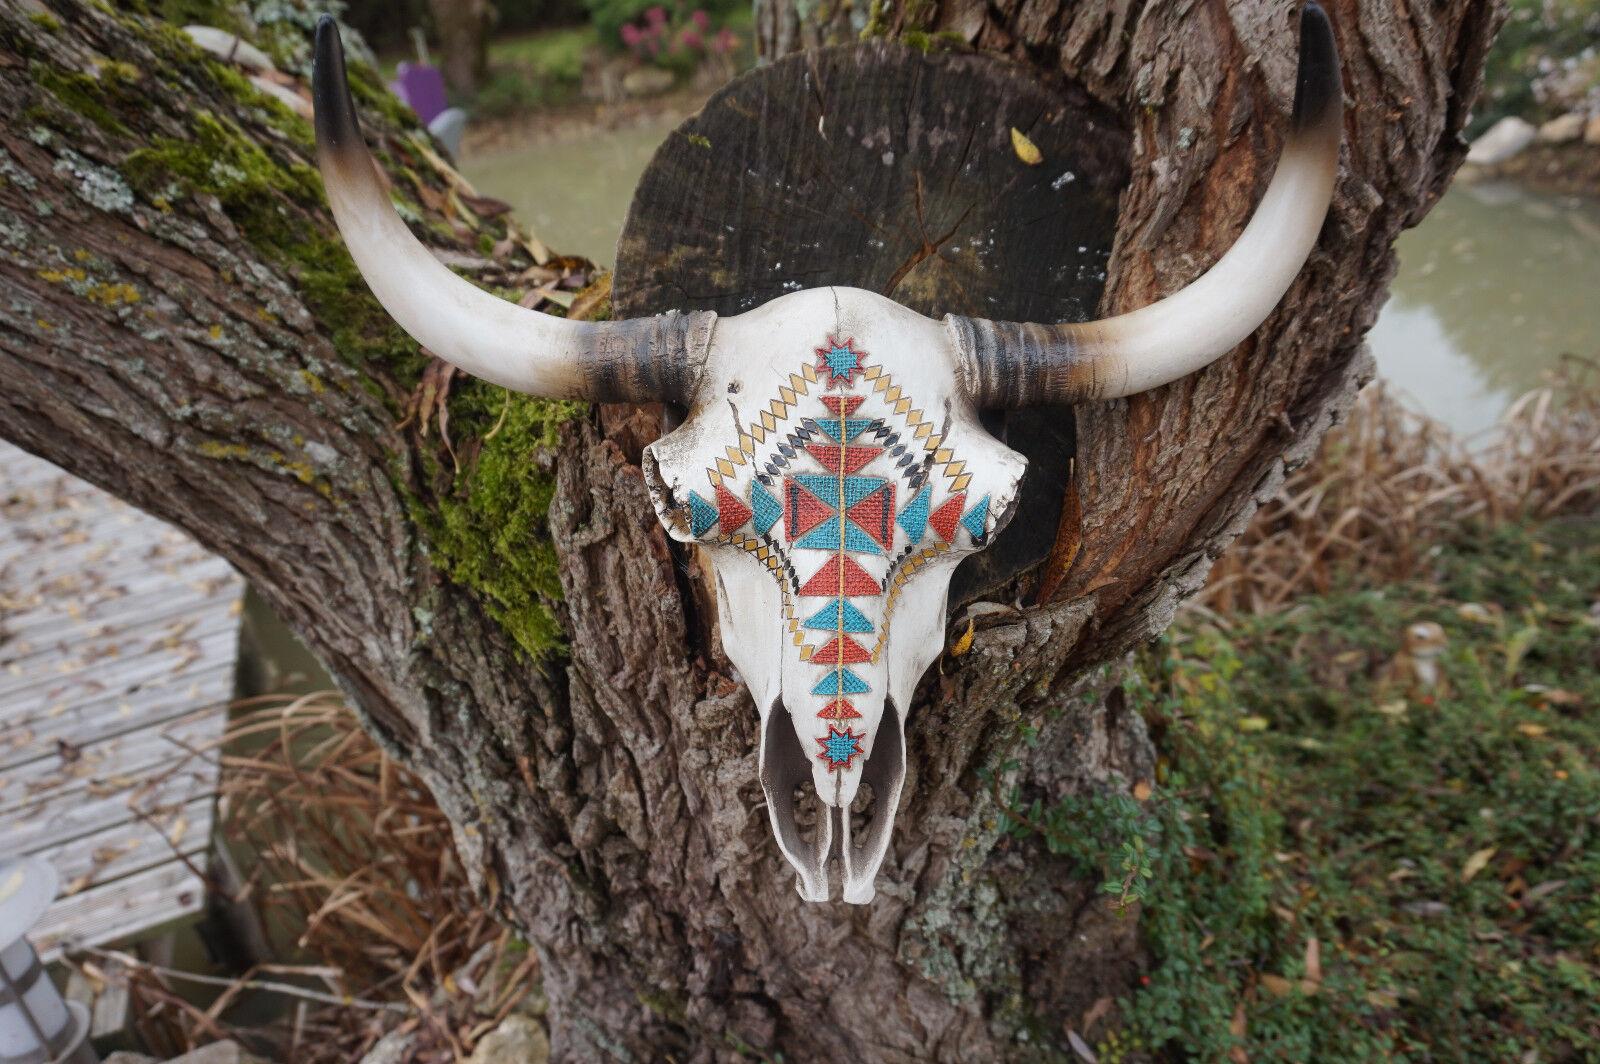 IN0299  GRANDE TETE DE MORT SQUELETTE FIGURINE CRANE BISON  VACHE AZTEQUE INDIEN